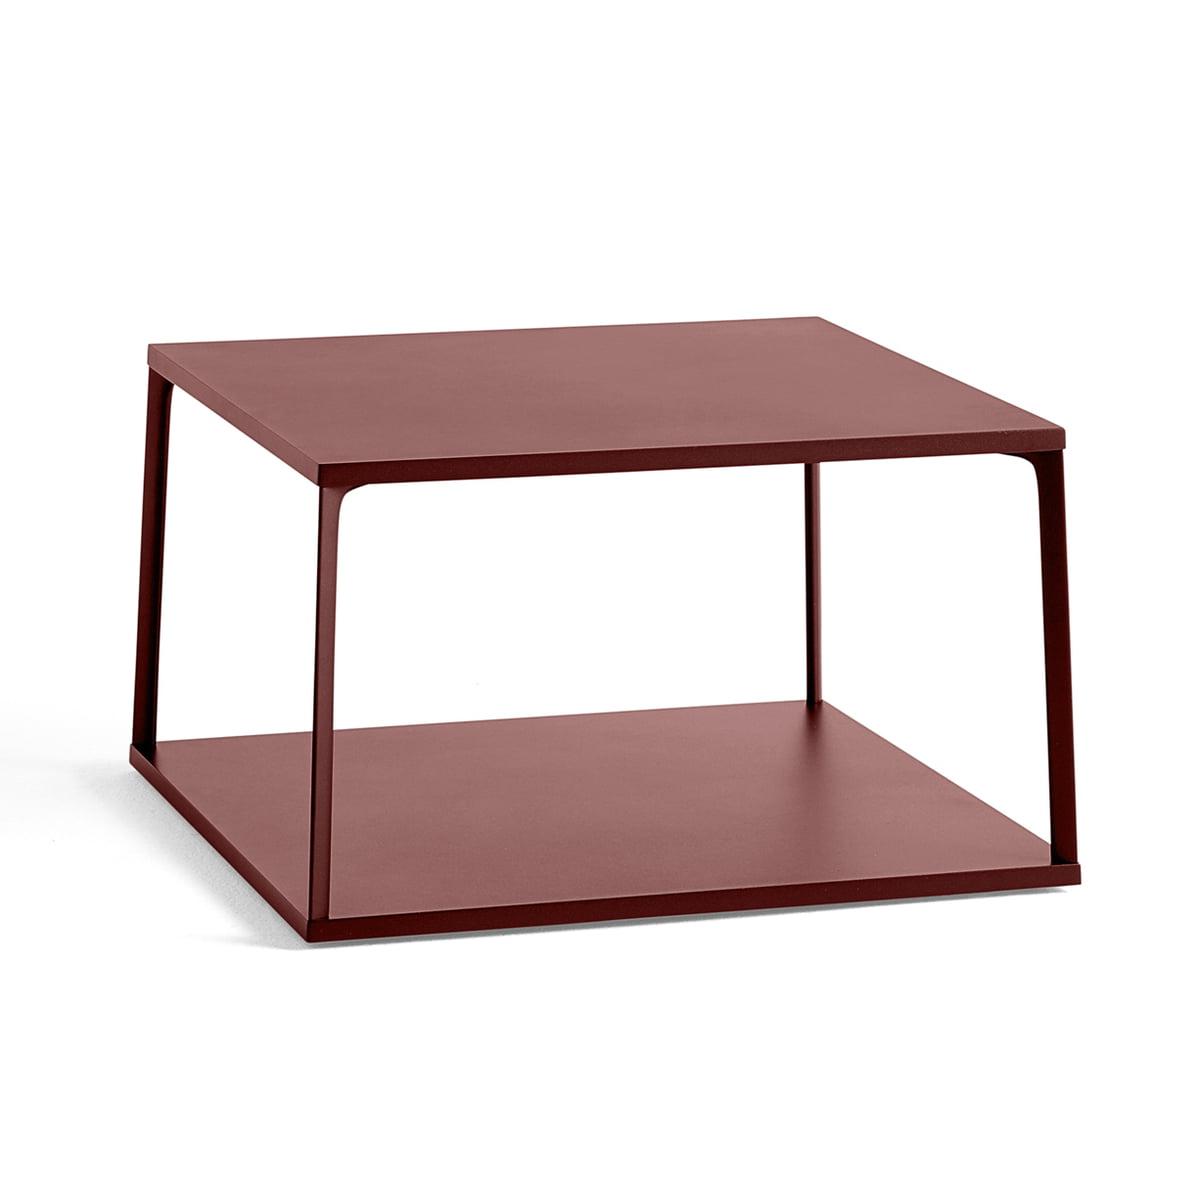 La table basse hay eiffel 65 x 65 cm brique